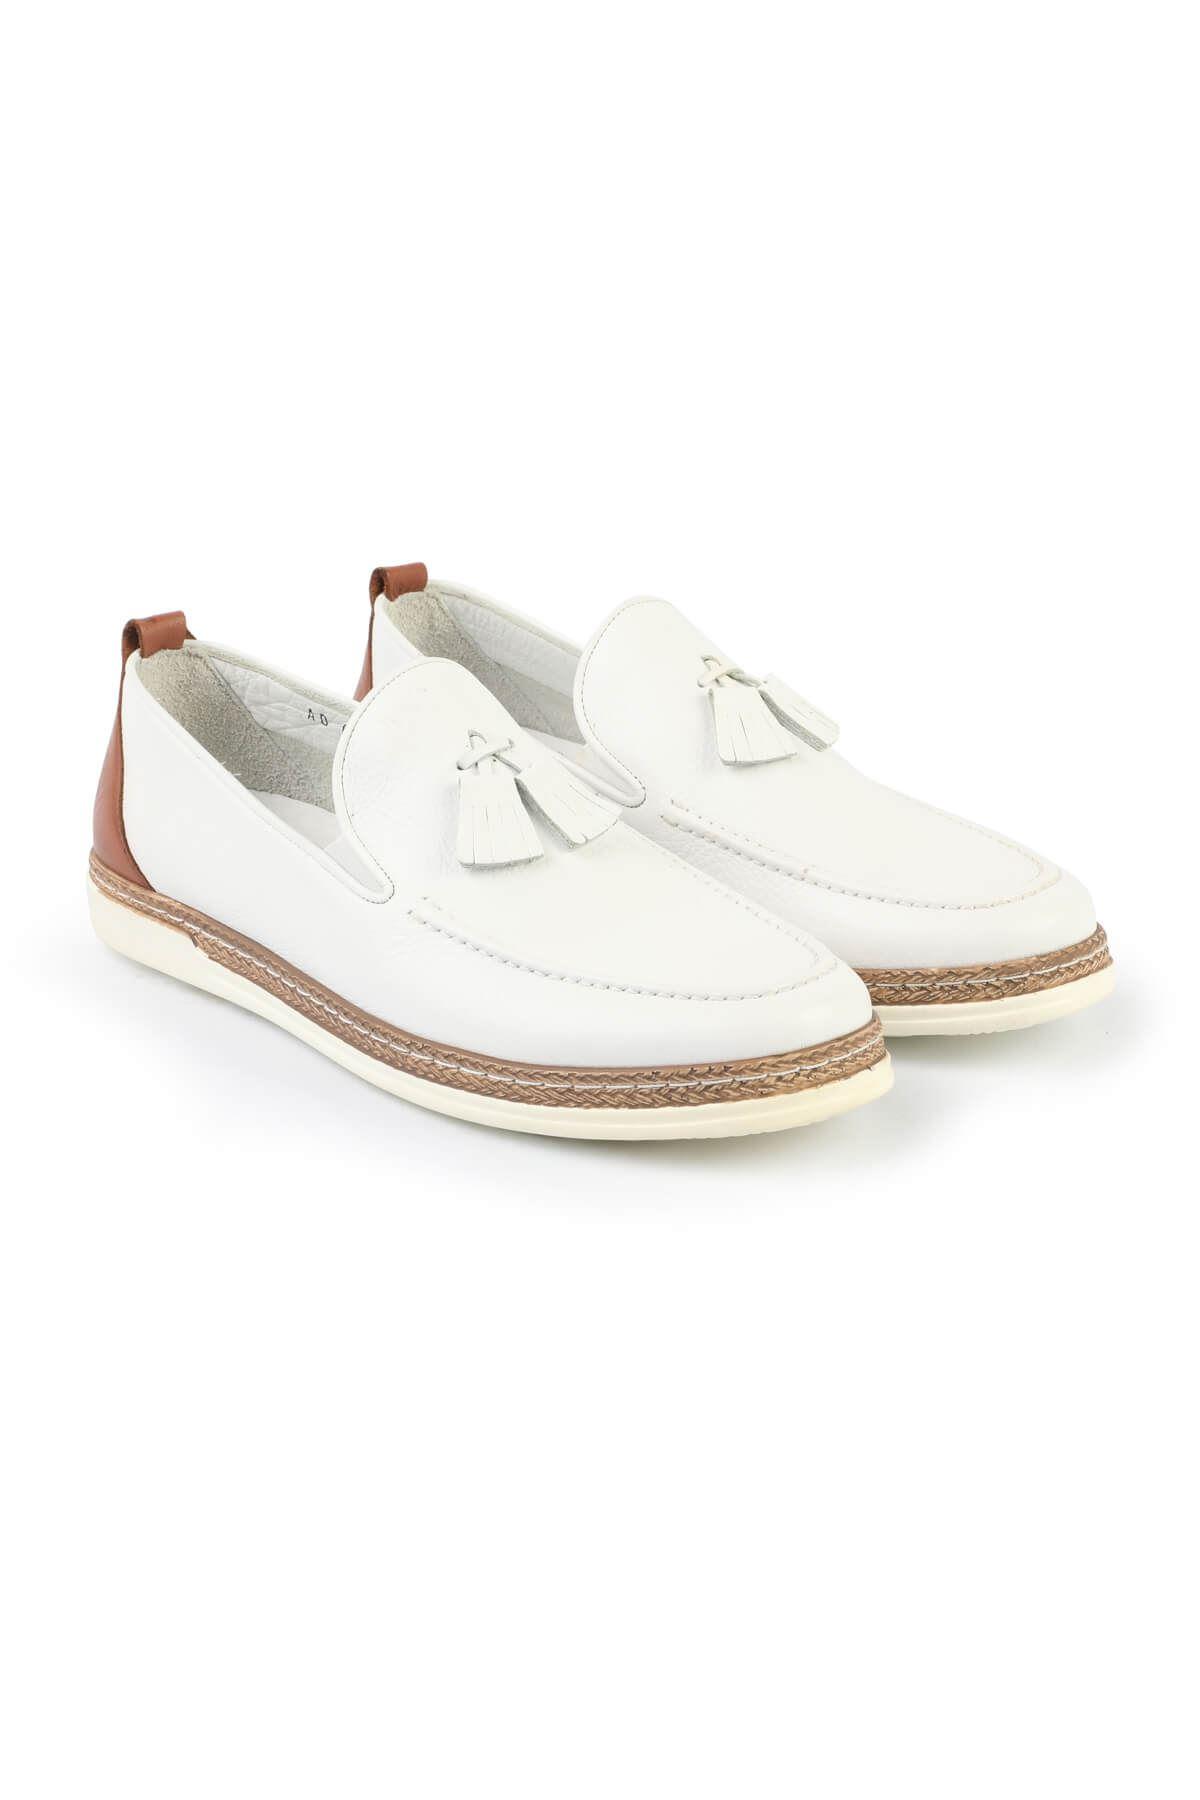 Libero C625 White Loafer Shoes